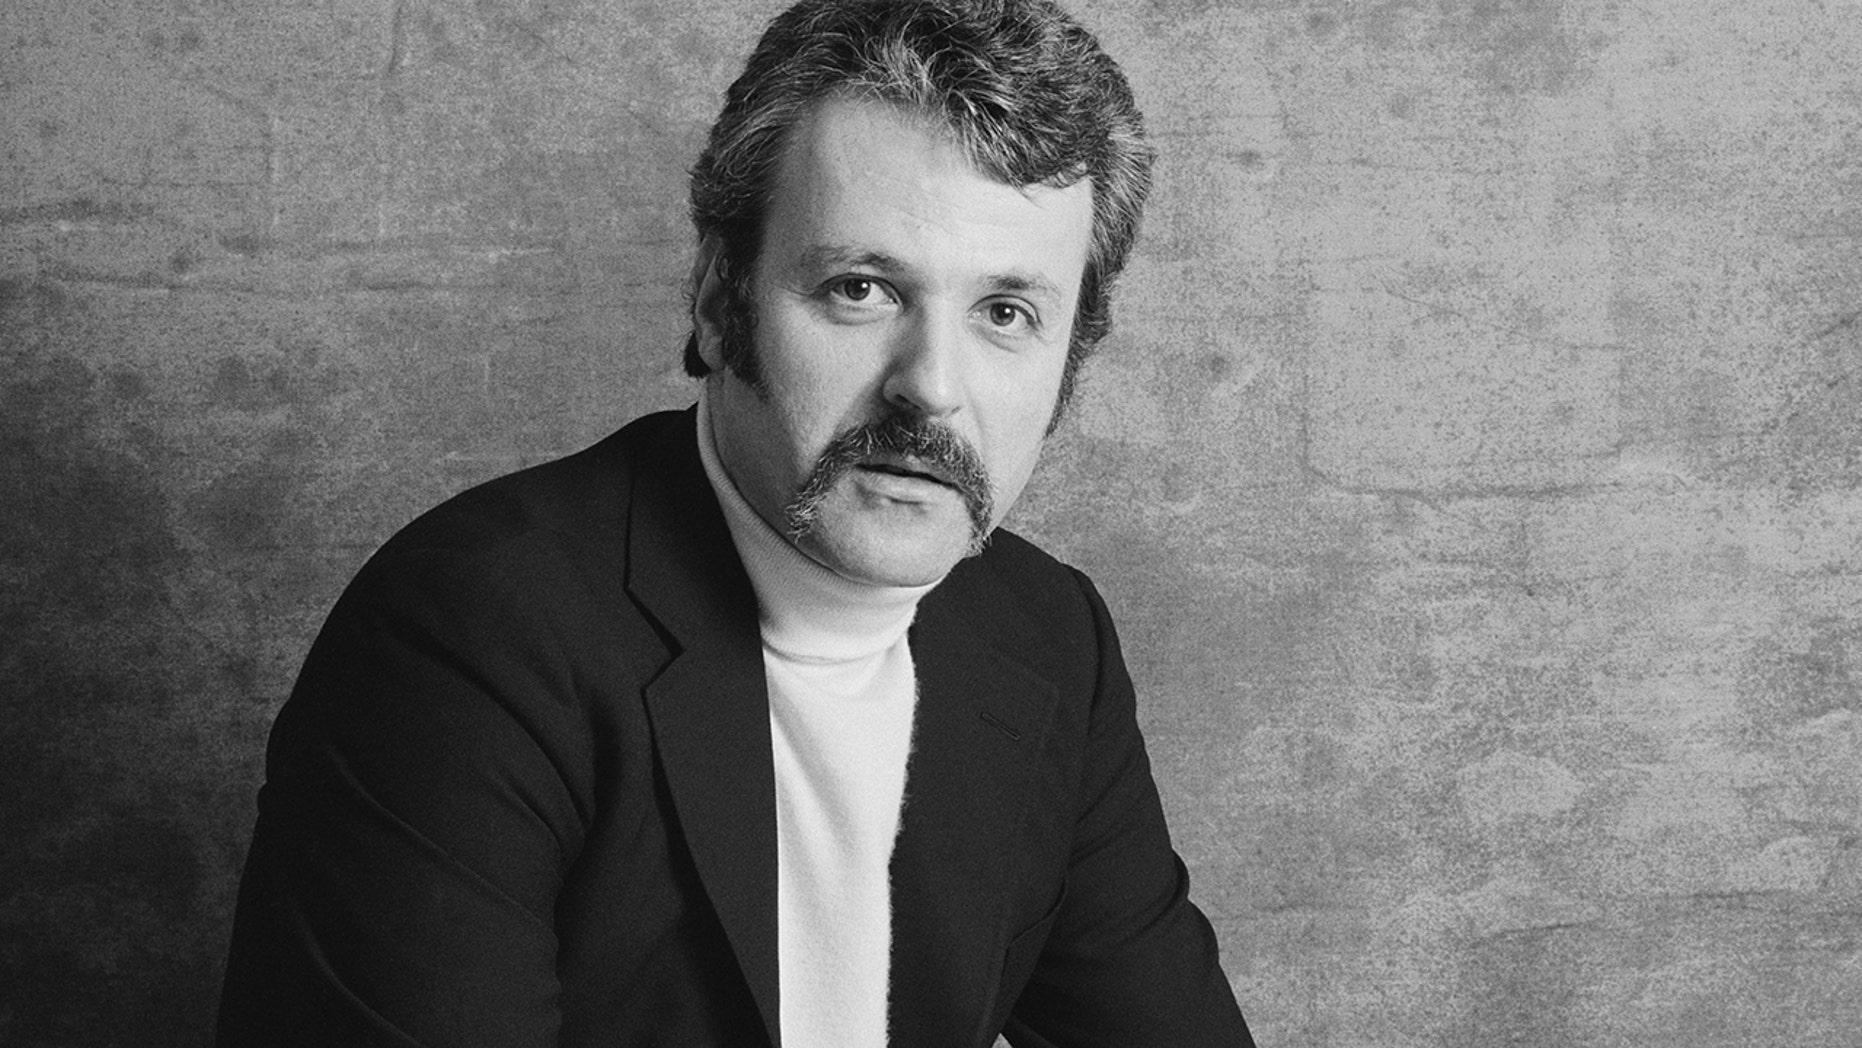 William Goldman, Butch Cassidy screenwriter, dies at 87